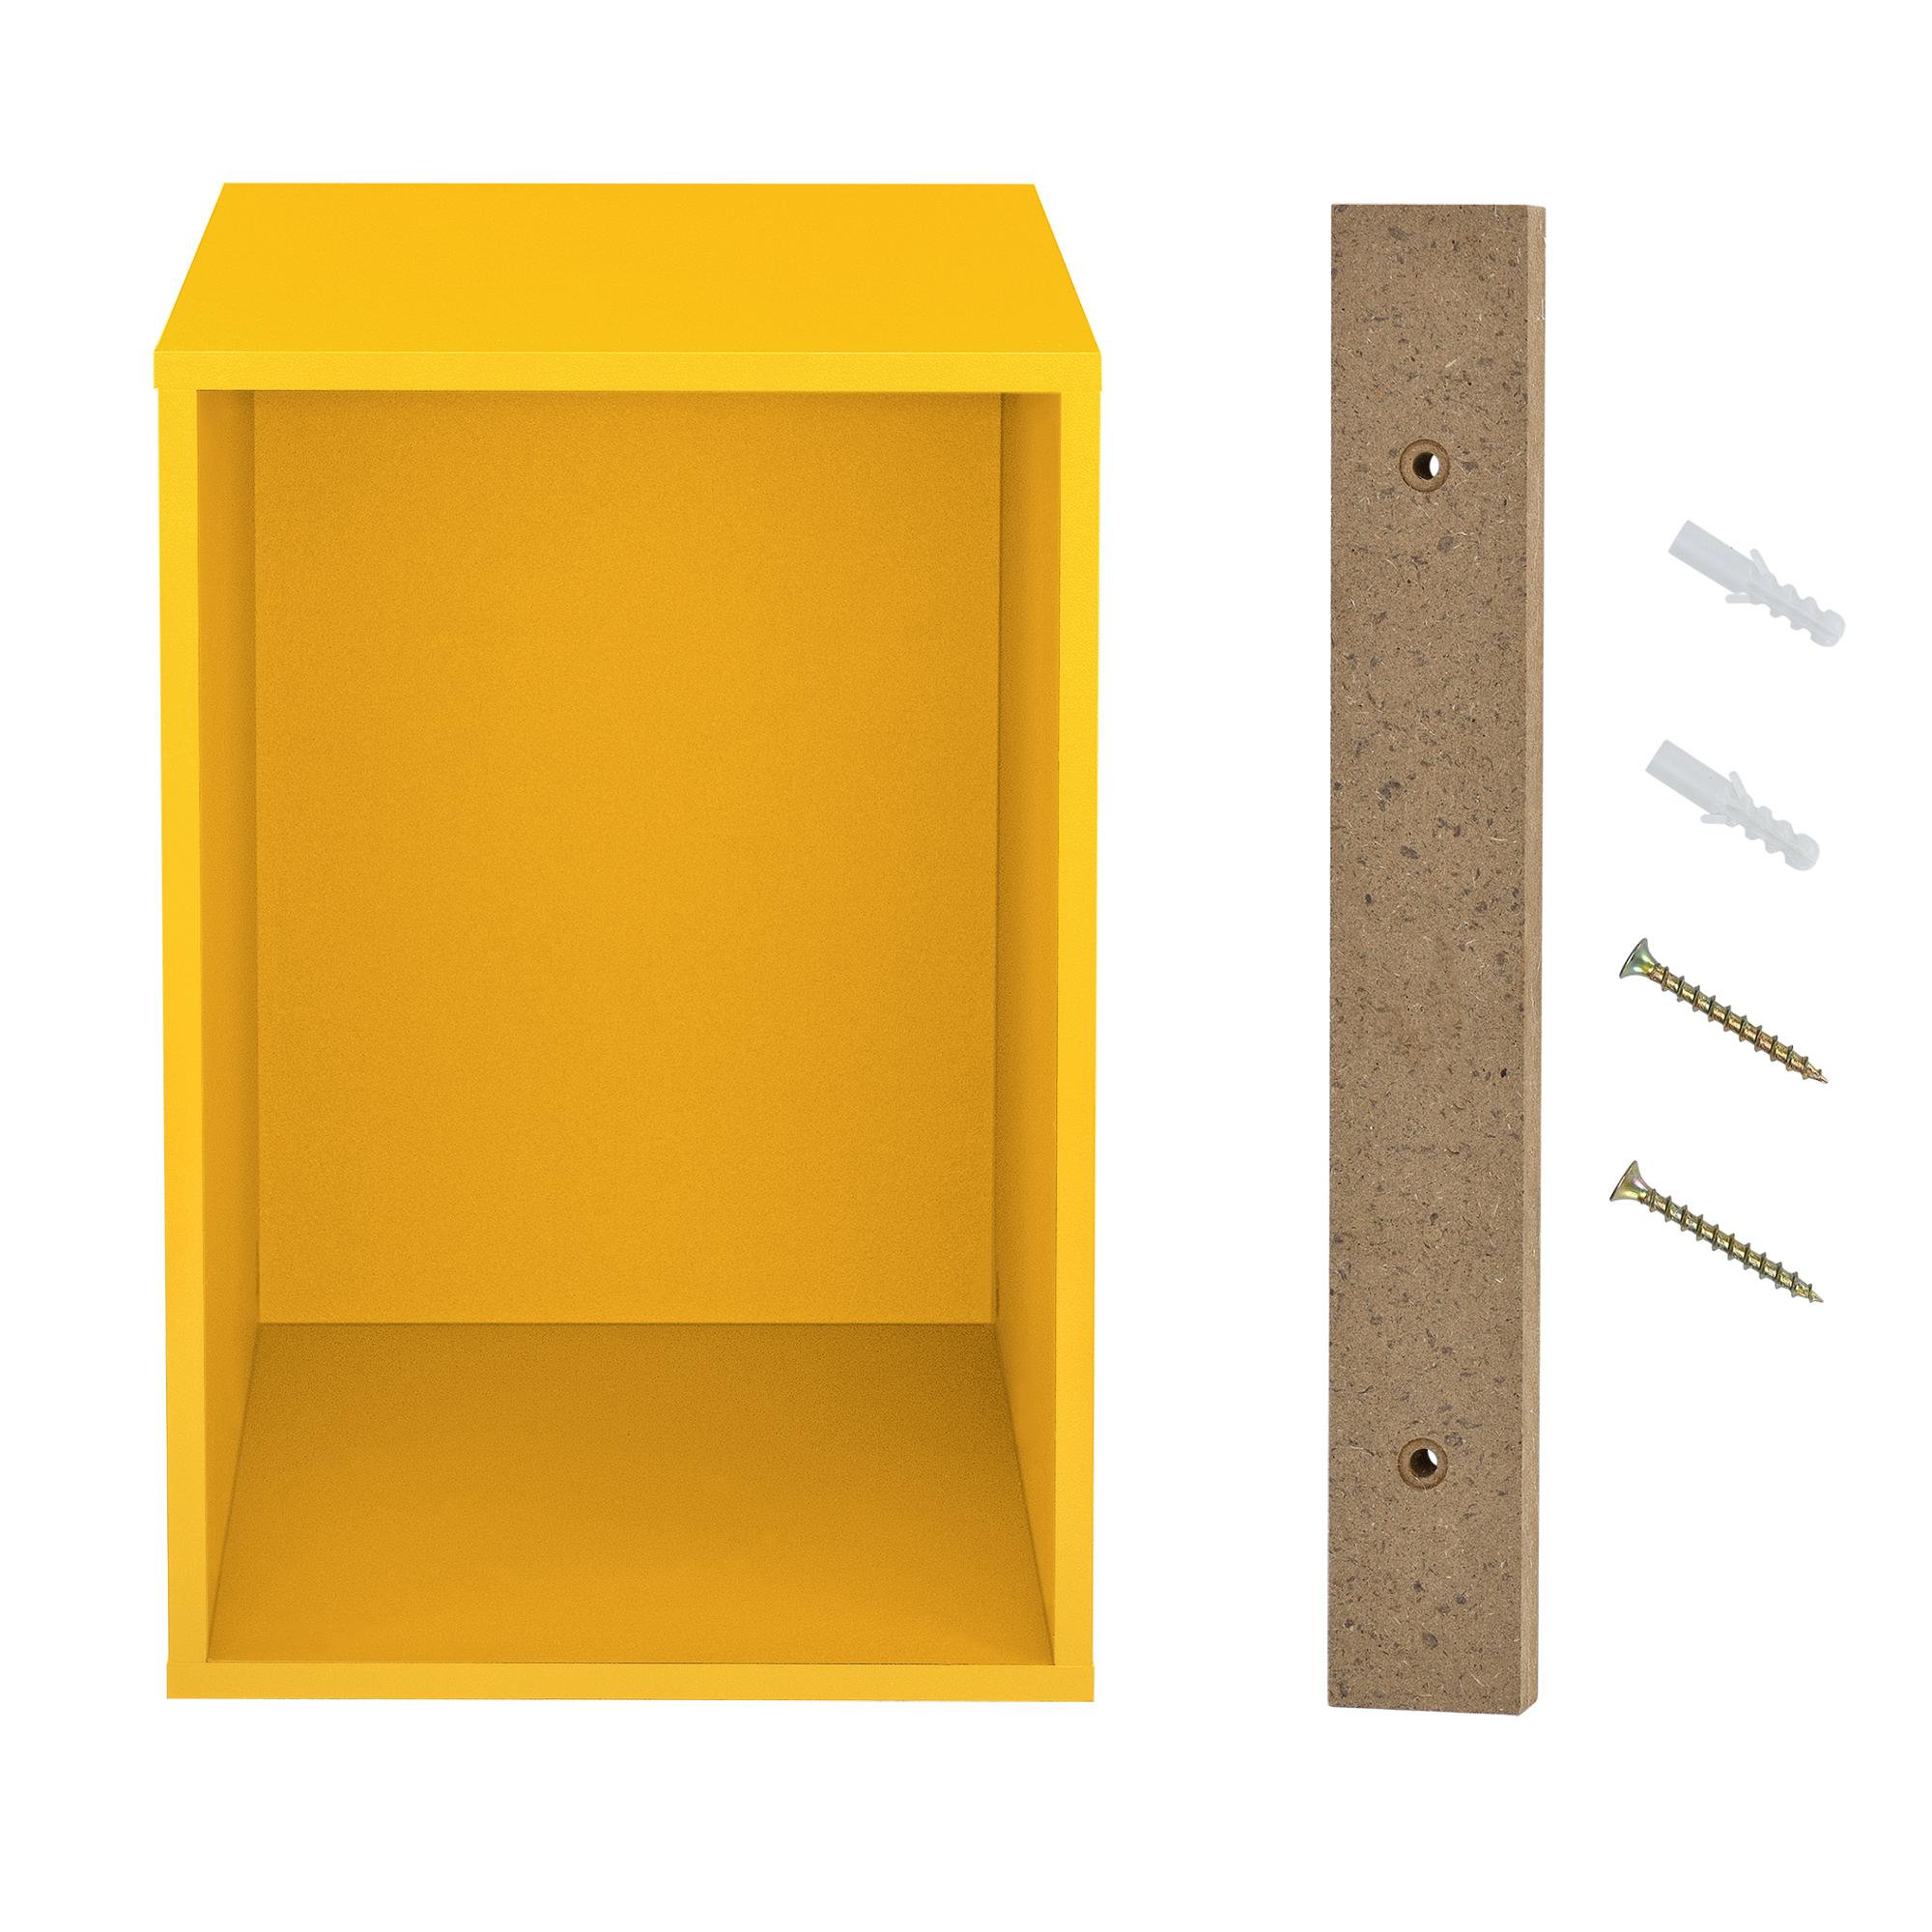 h ngeschrank 30x45x40cm senfgelb wandschrank schrank wandregal regal ebay. Black Bedroom Furniture Sets. Home Design Ideas